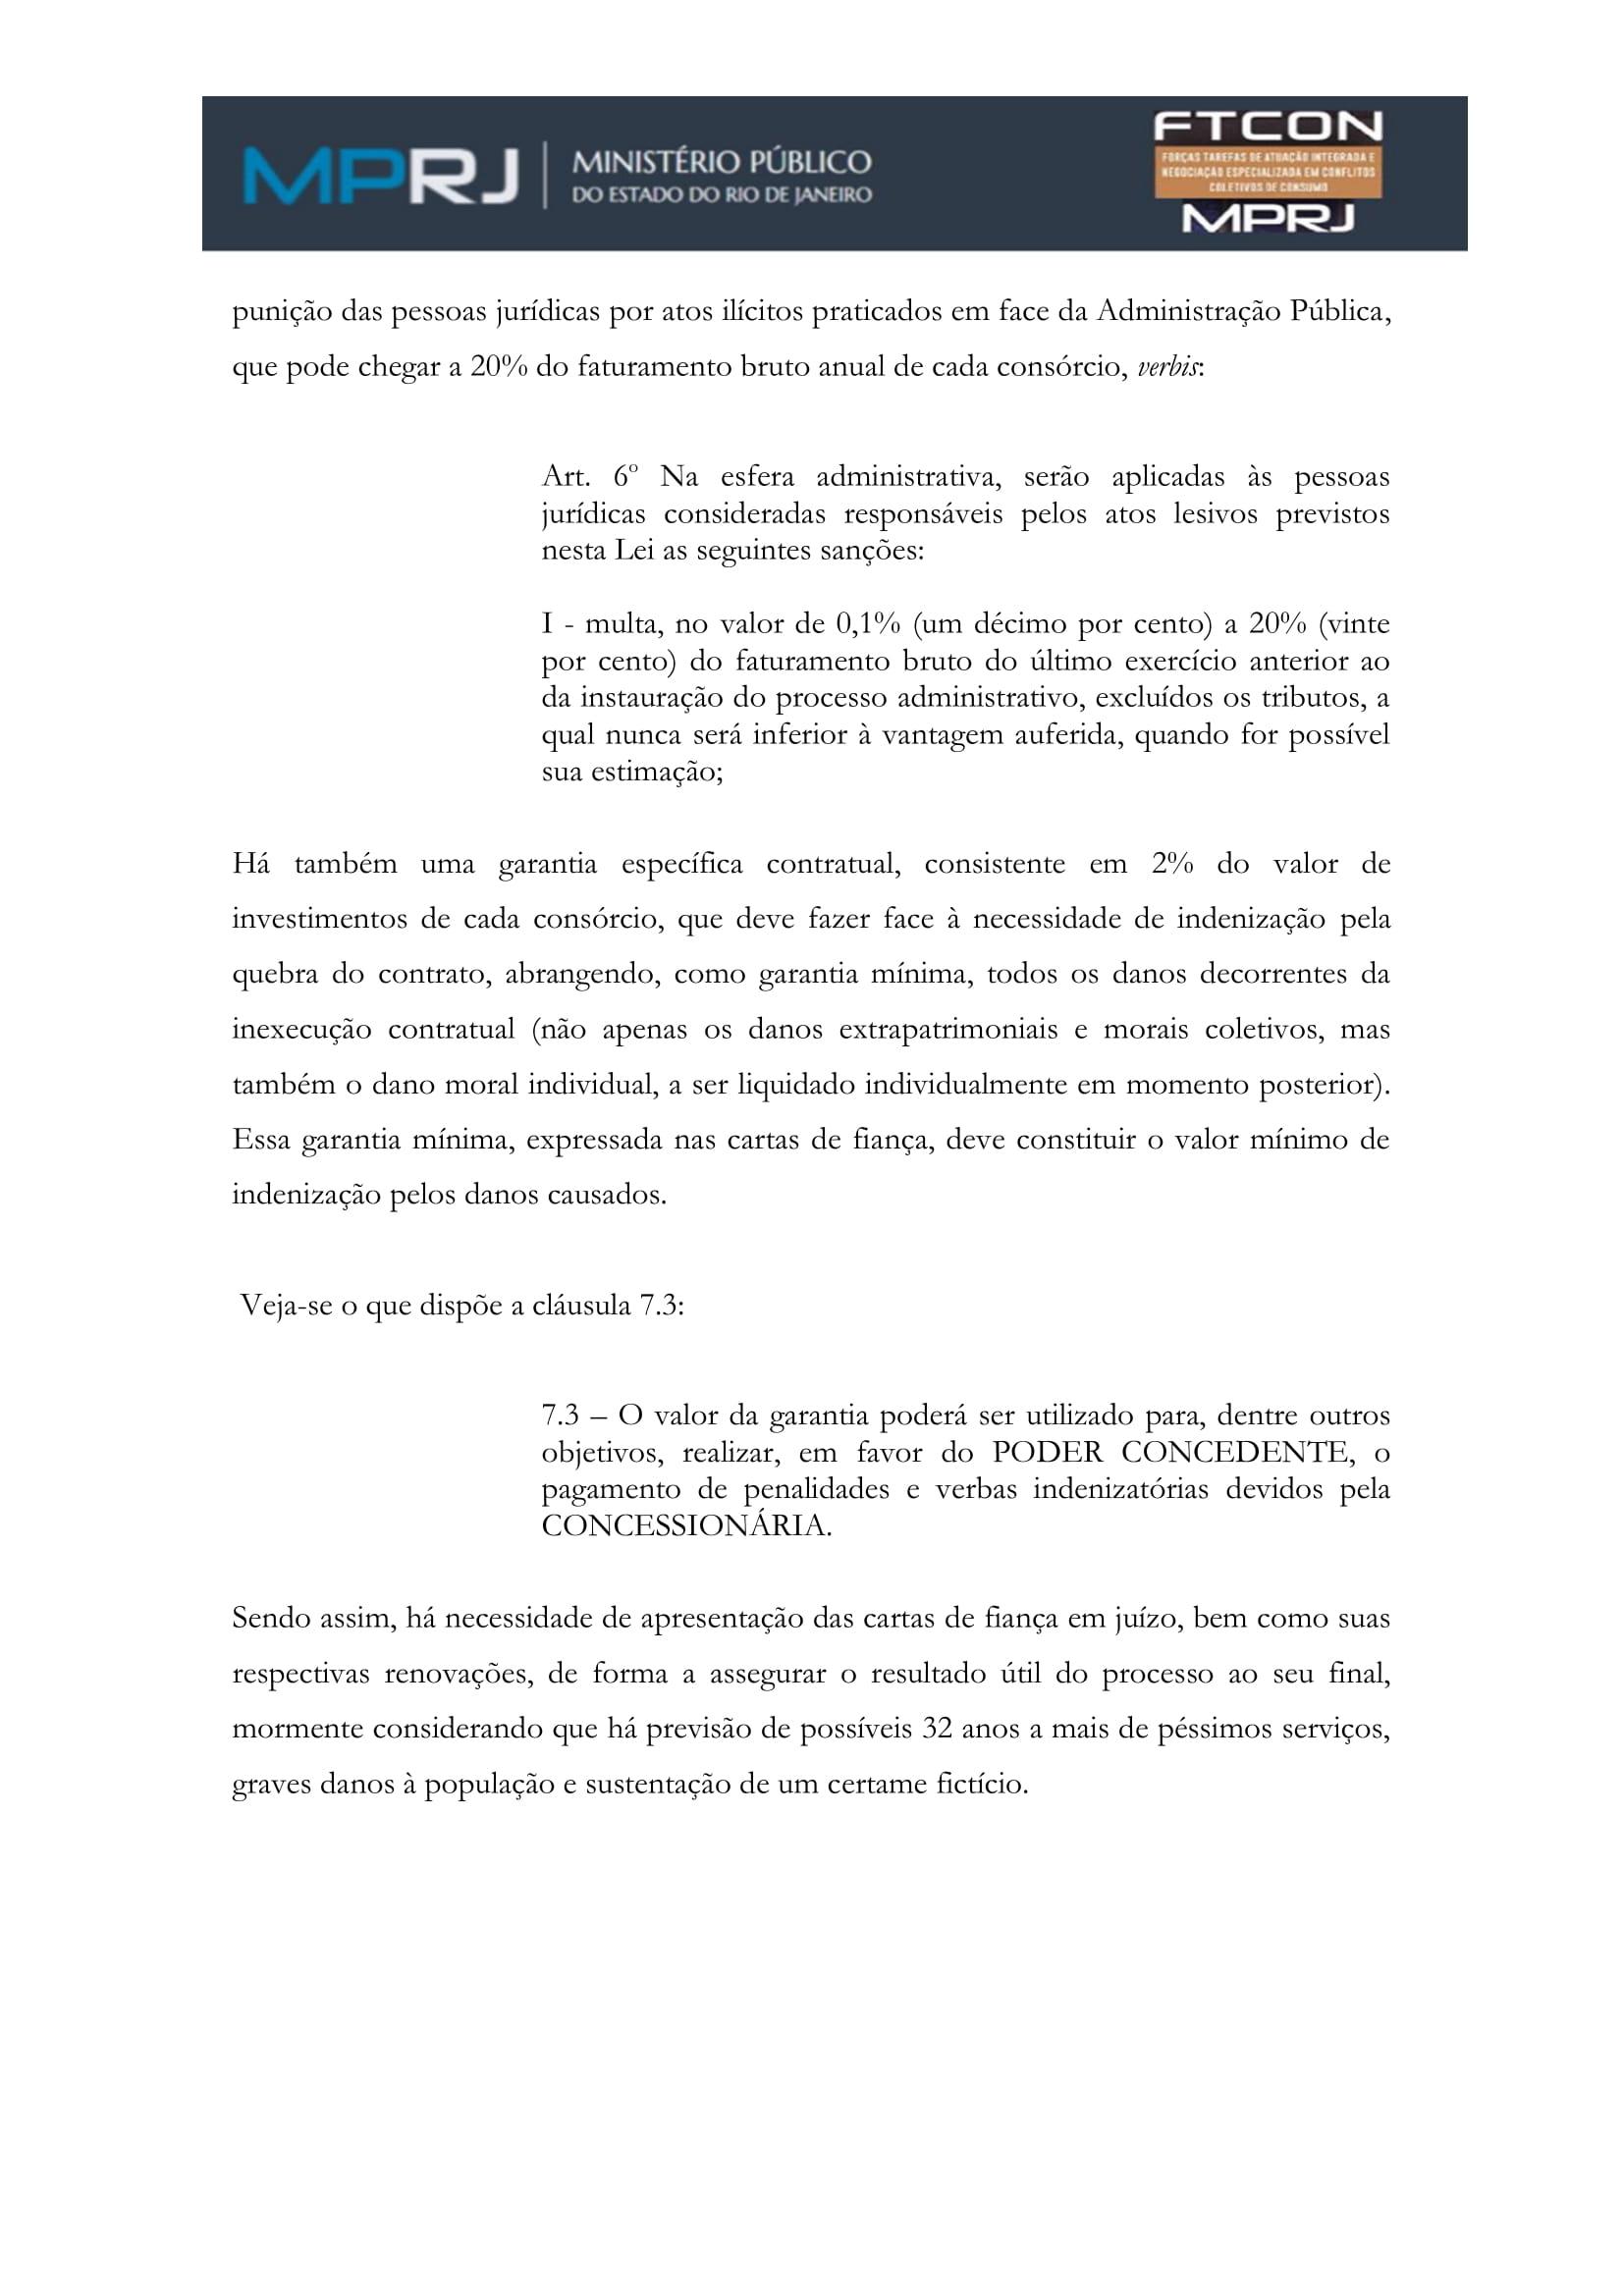 acp_caducidade_onibus_dr_rt-133